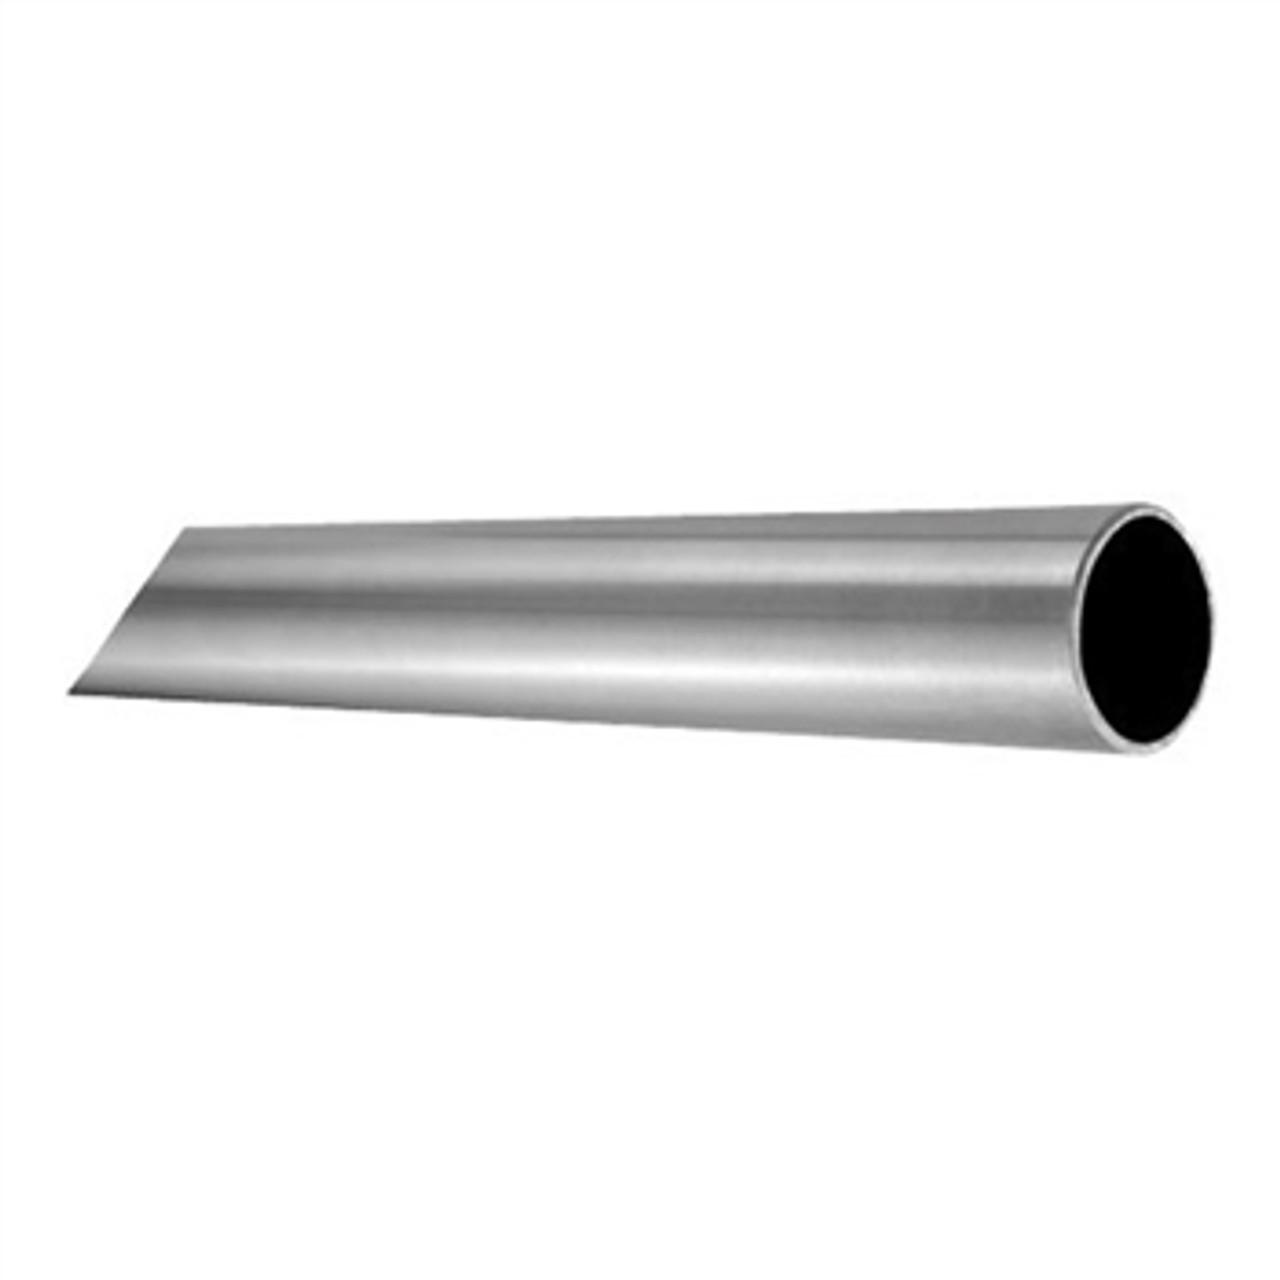 "E001 Stainless Steel Tube, 1 2/3"", 9-foot"